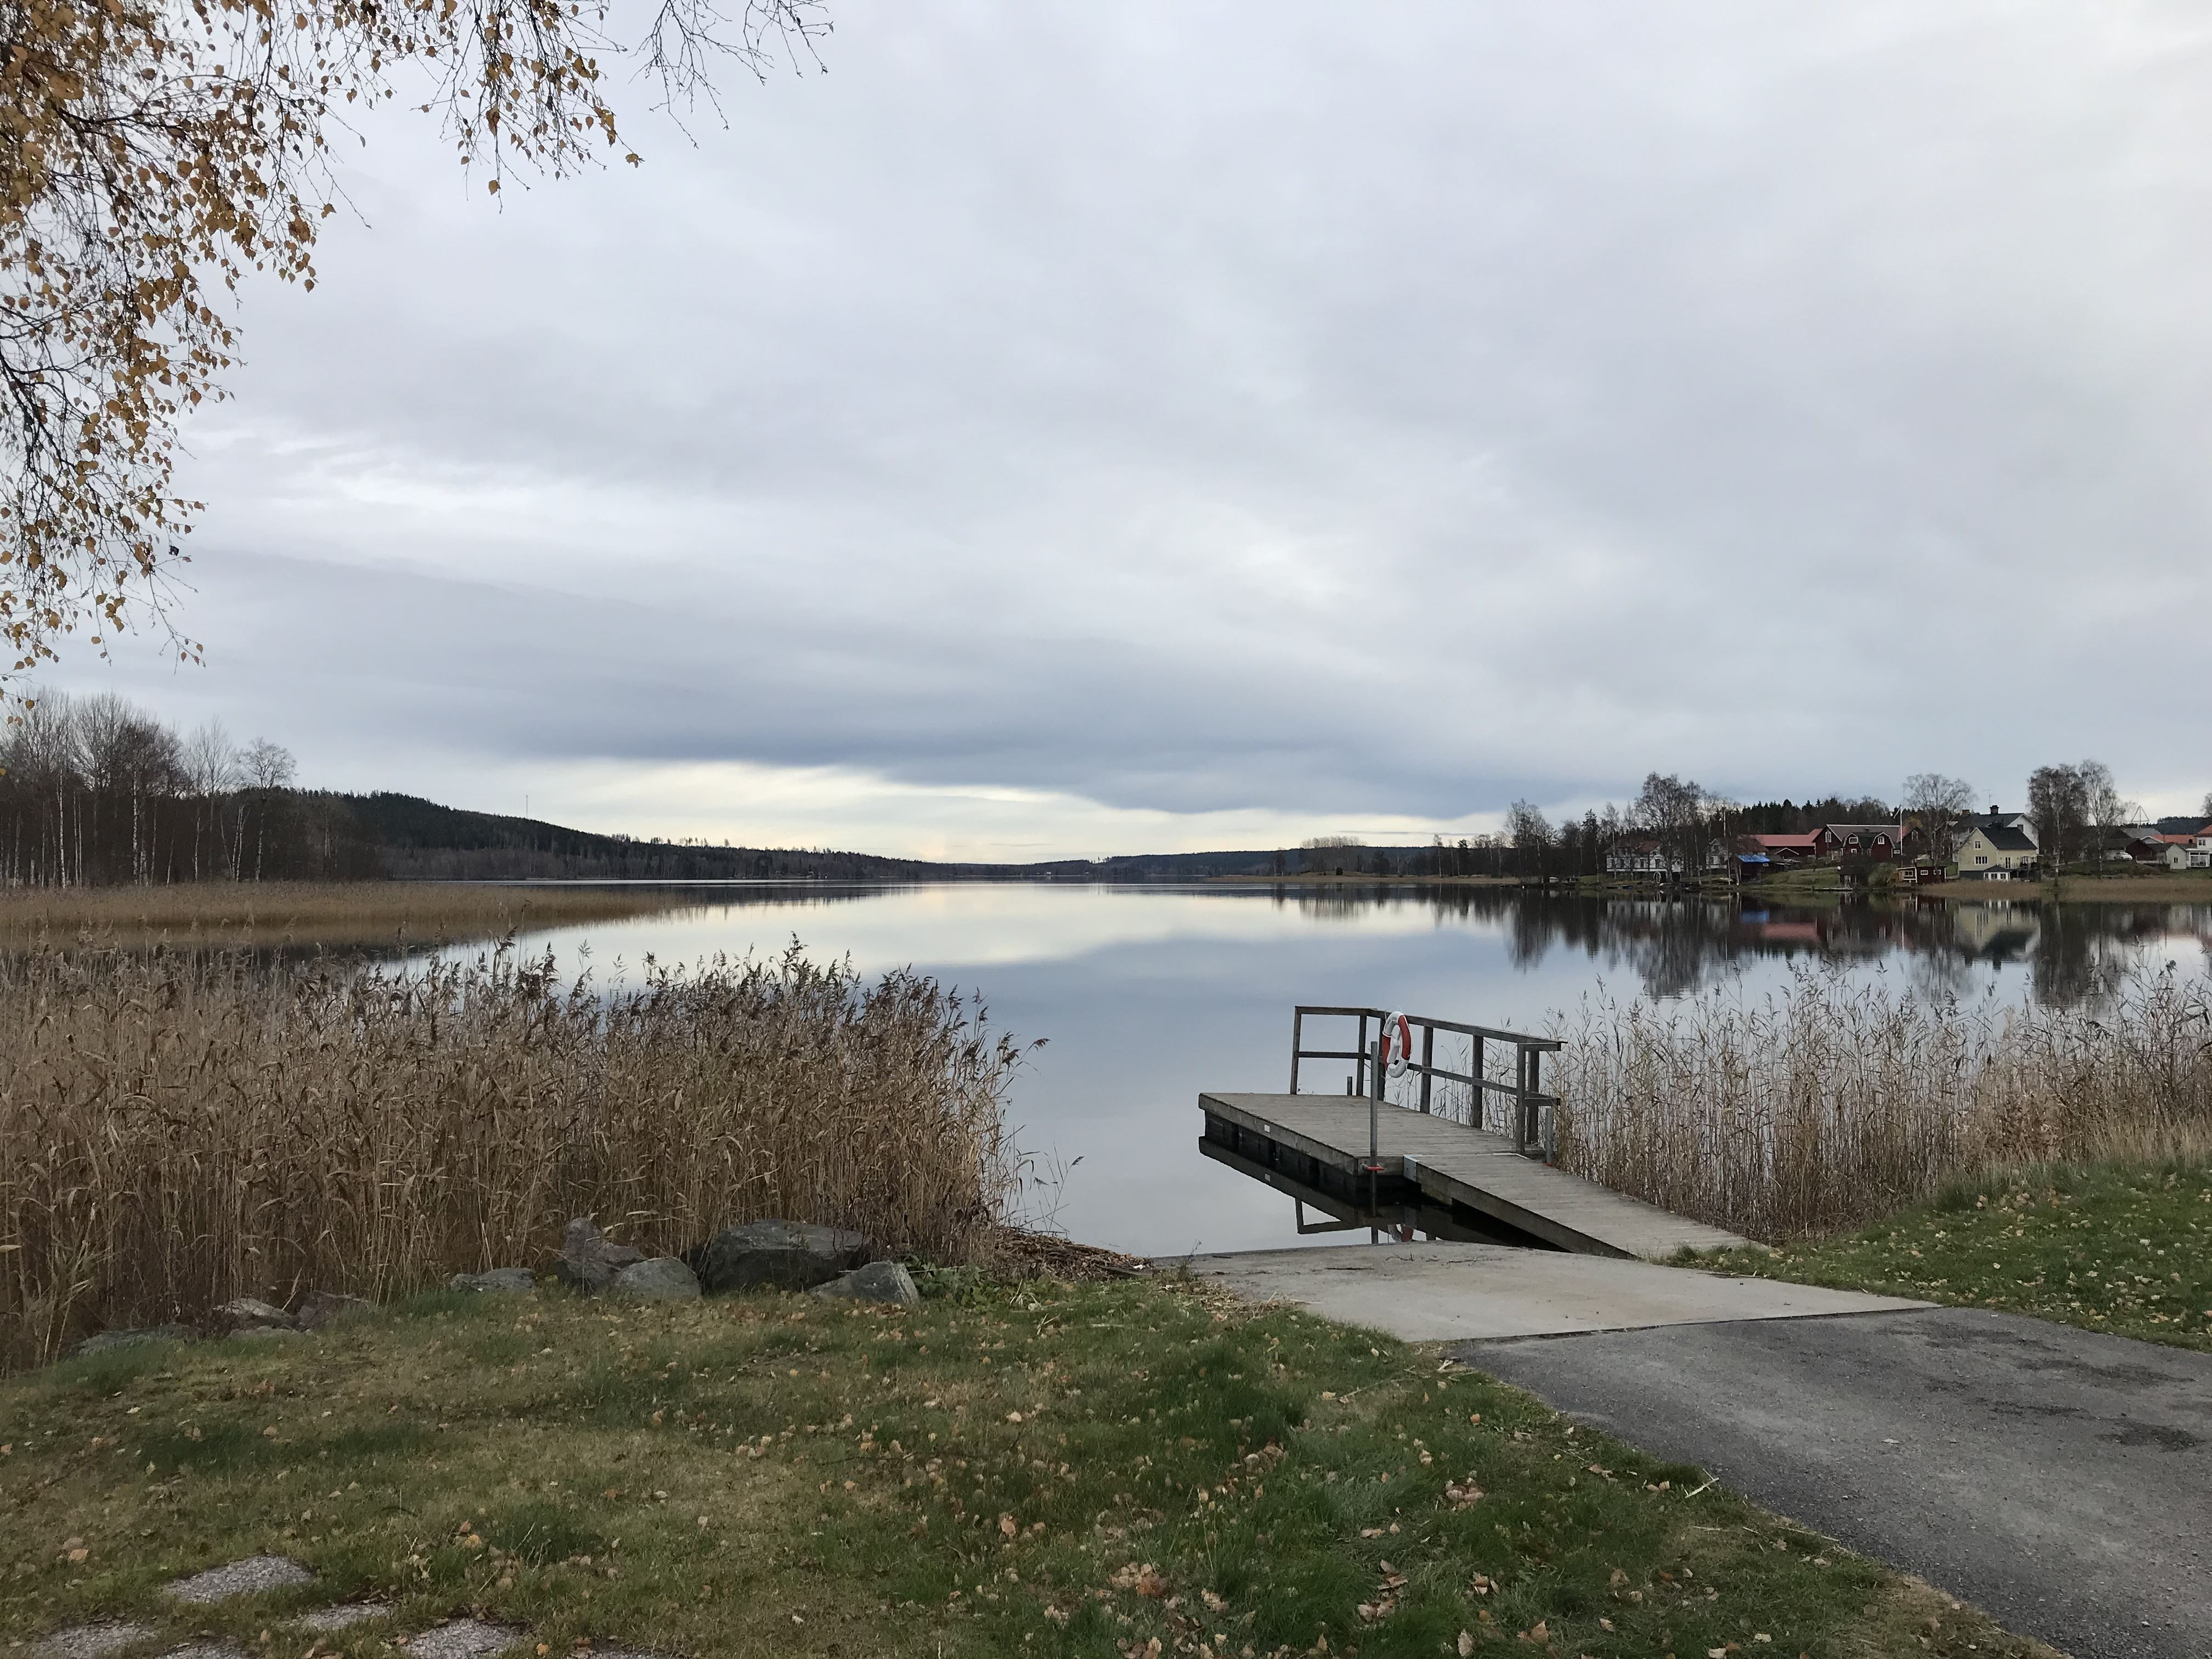 Fiskekort Husby Norra Fiskevårdsområde